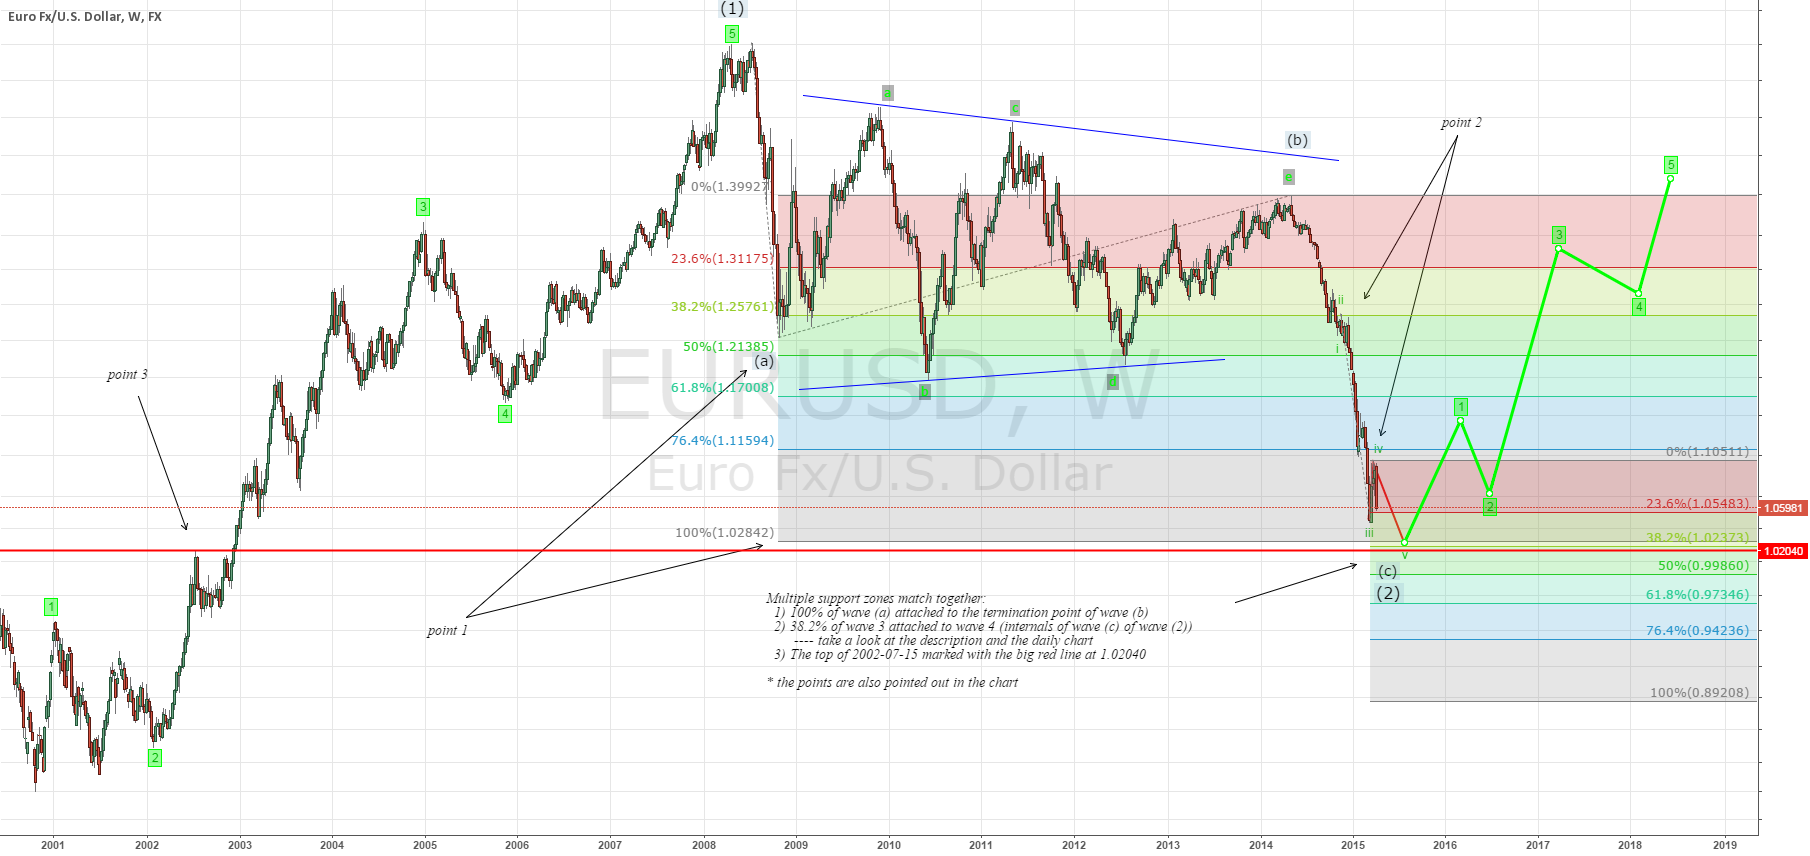 Week5: EURUSD will rise